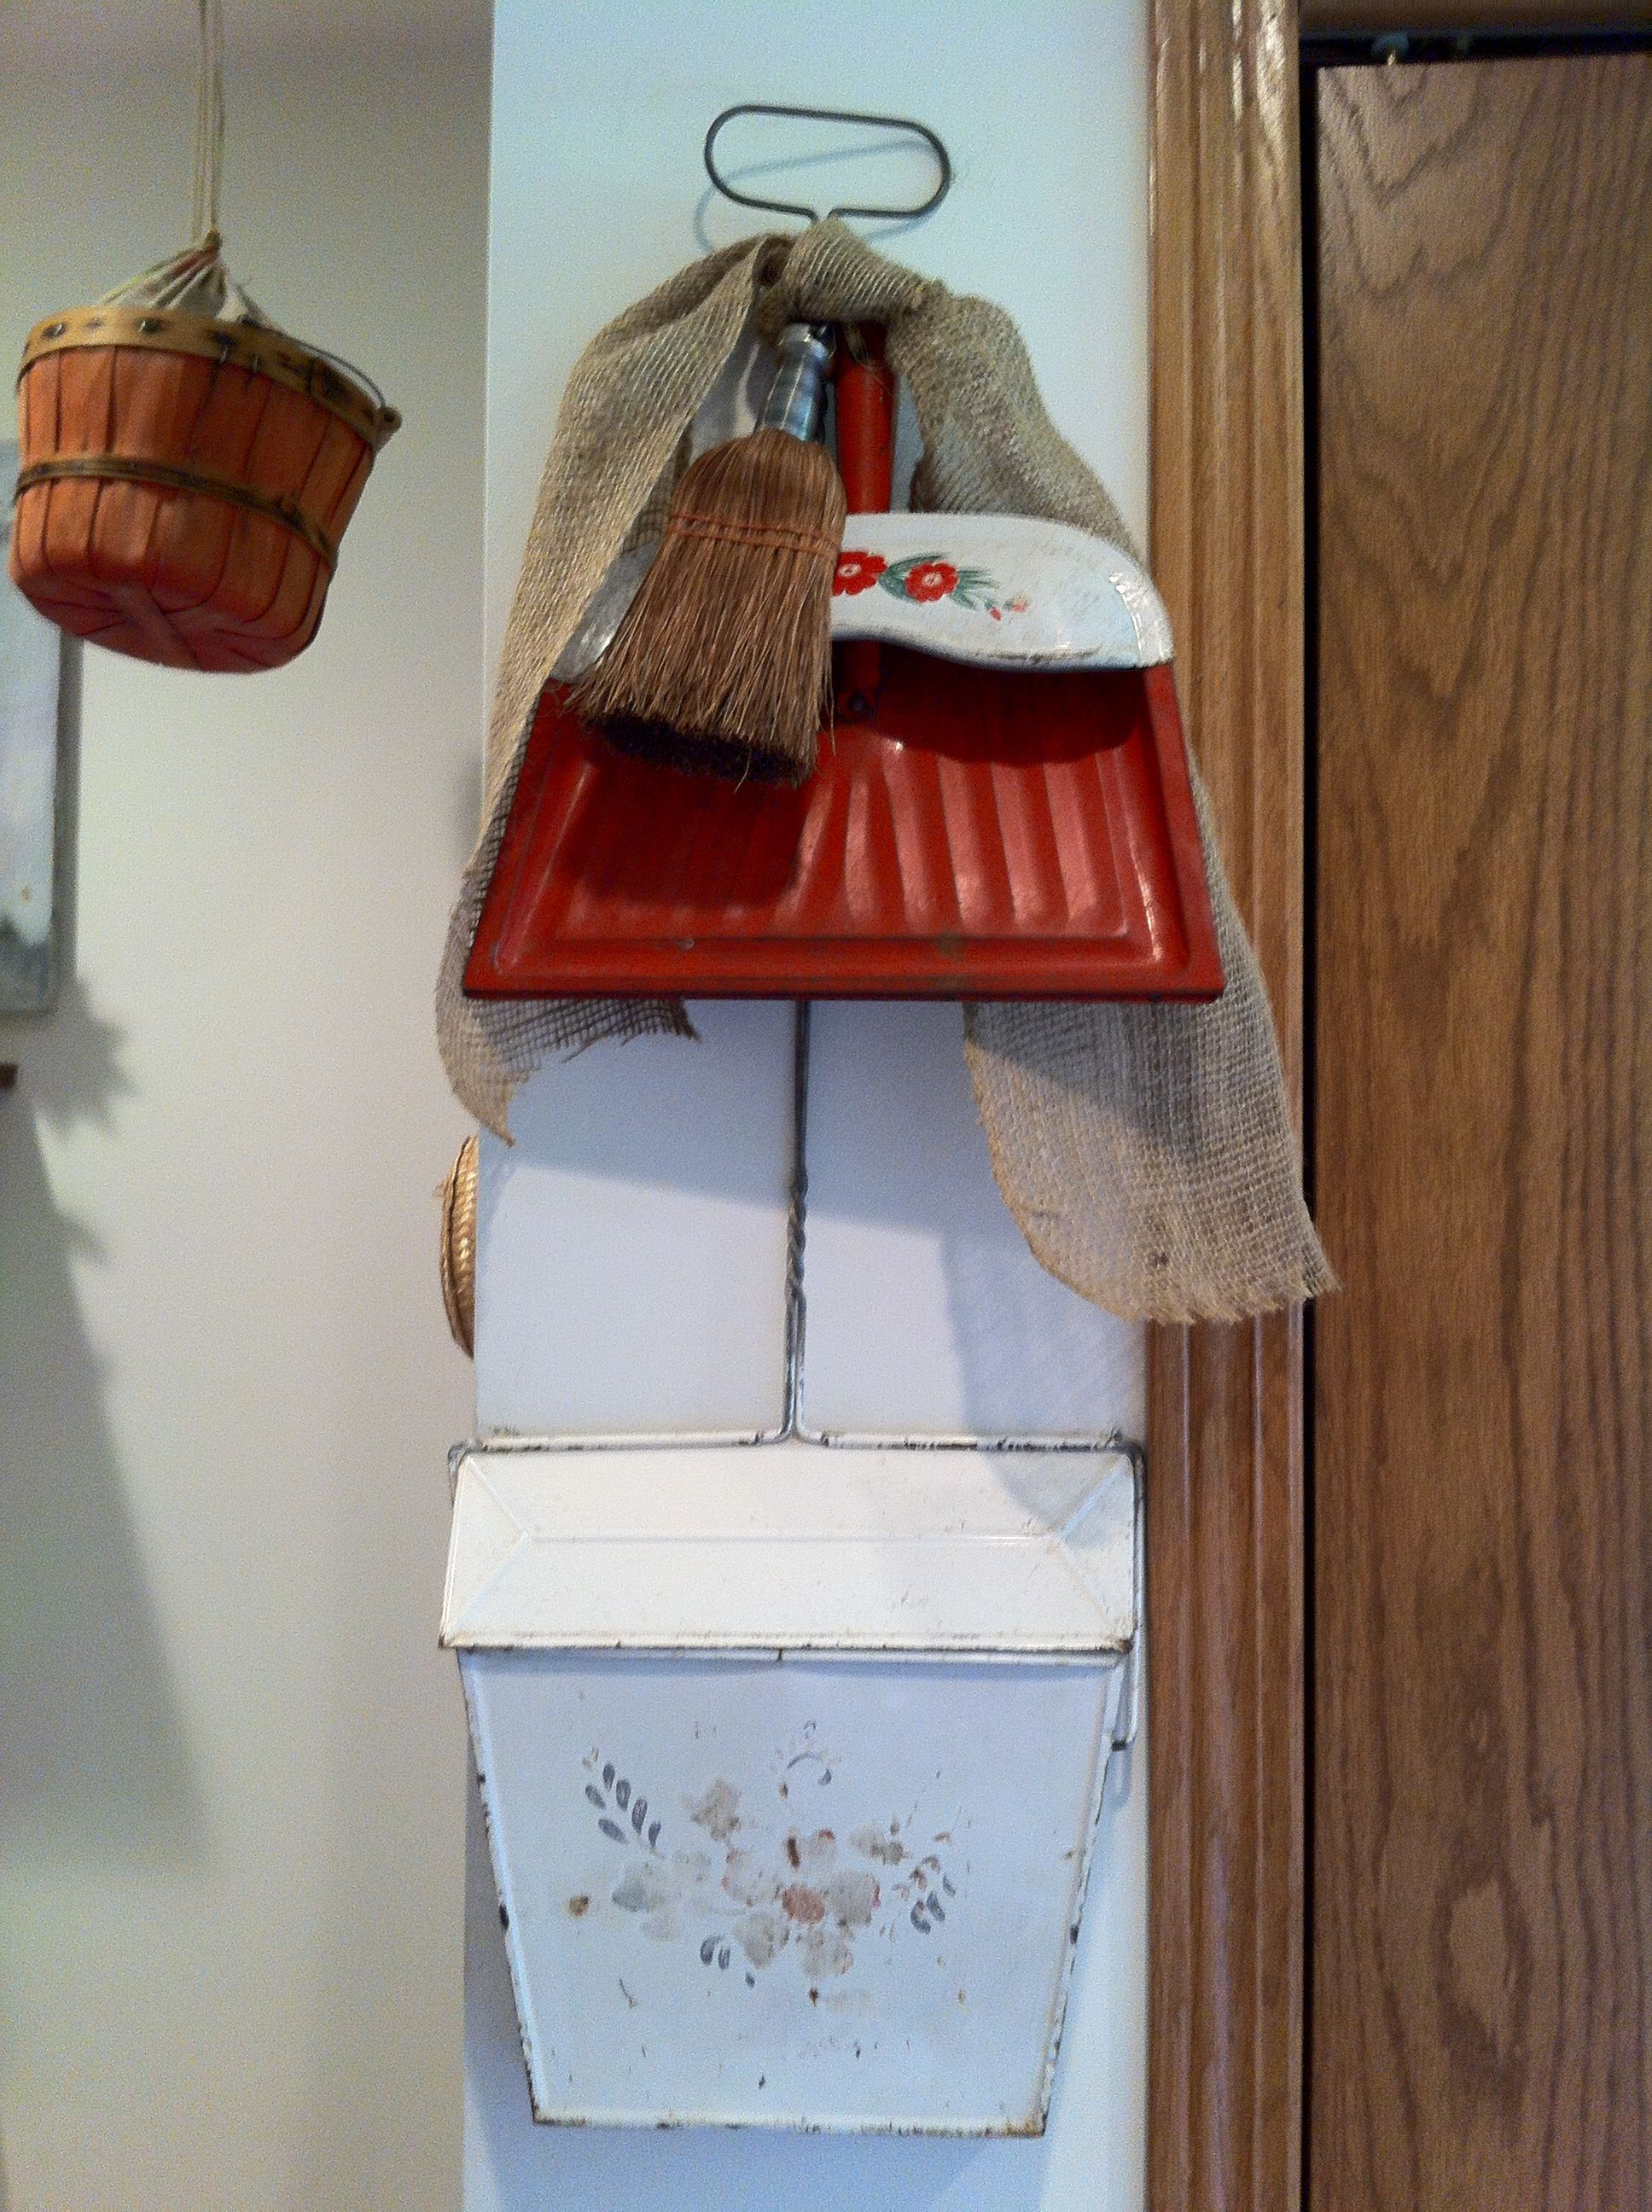 Vintage dustpans an old whisk broom and burlap ribbon.